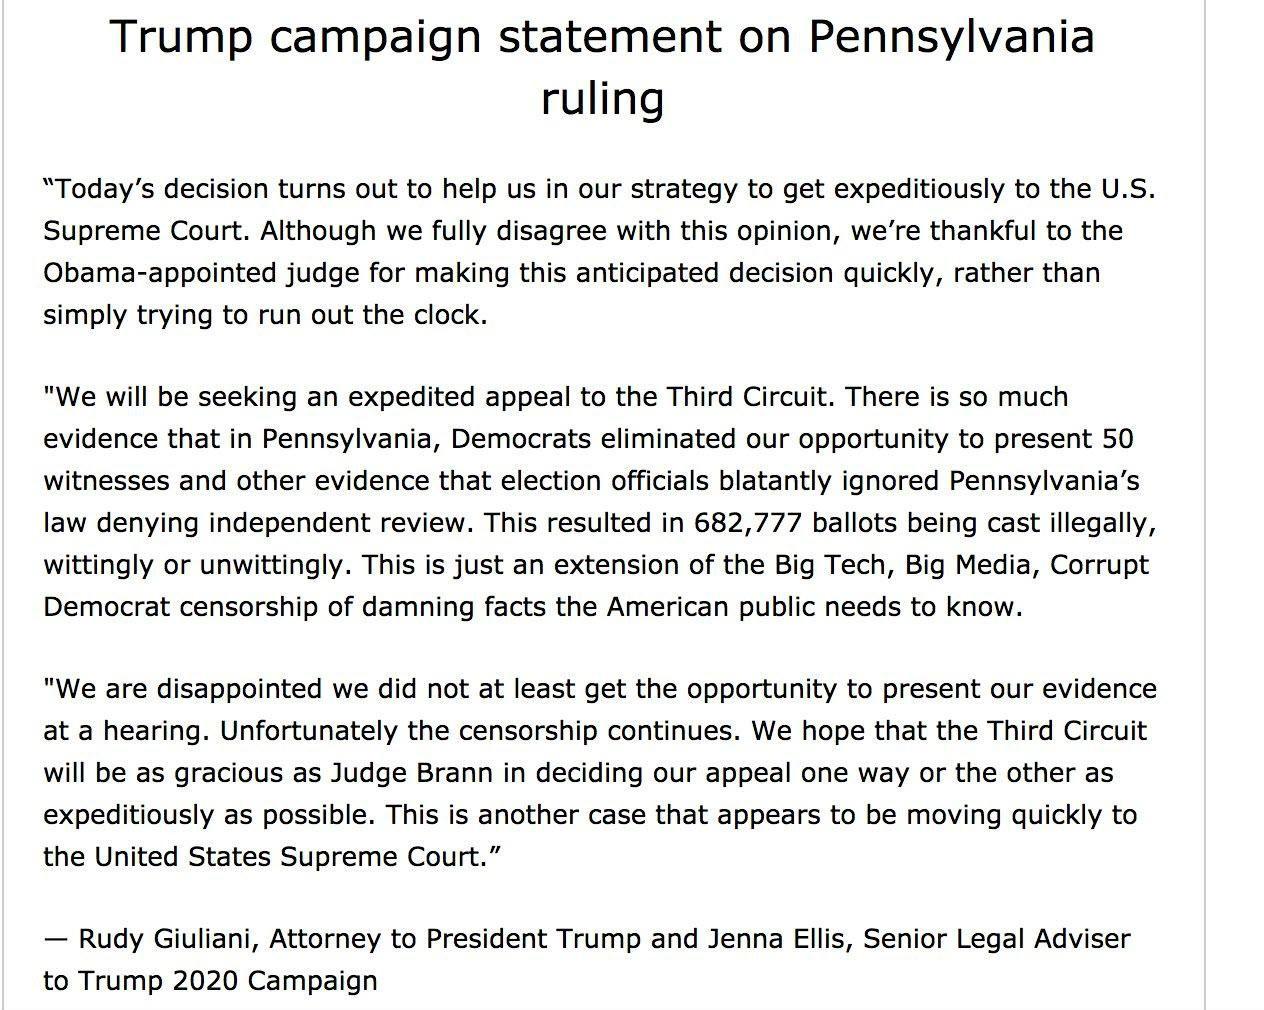 Trump campaign statement on Pennsylvania ruling